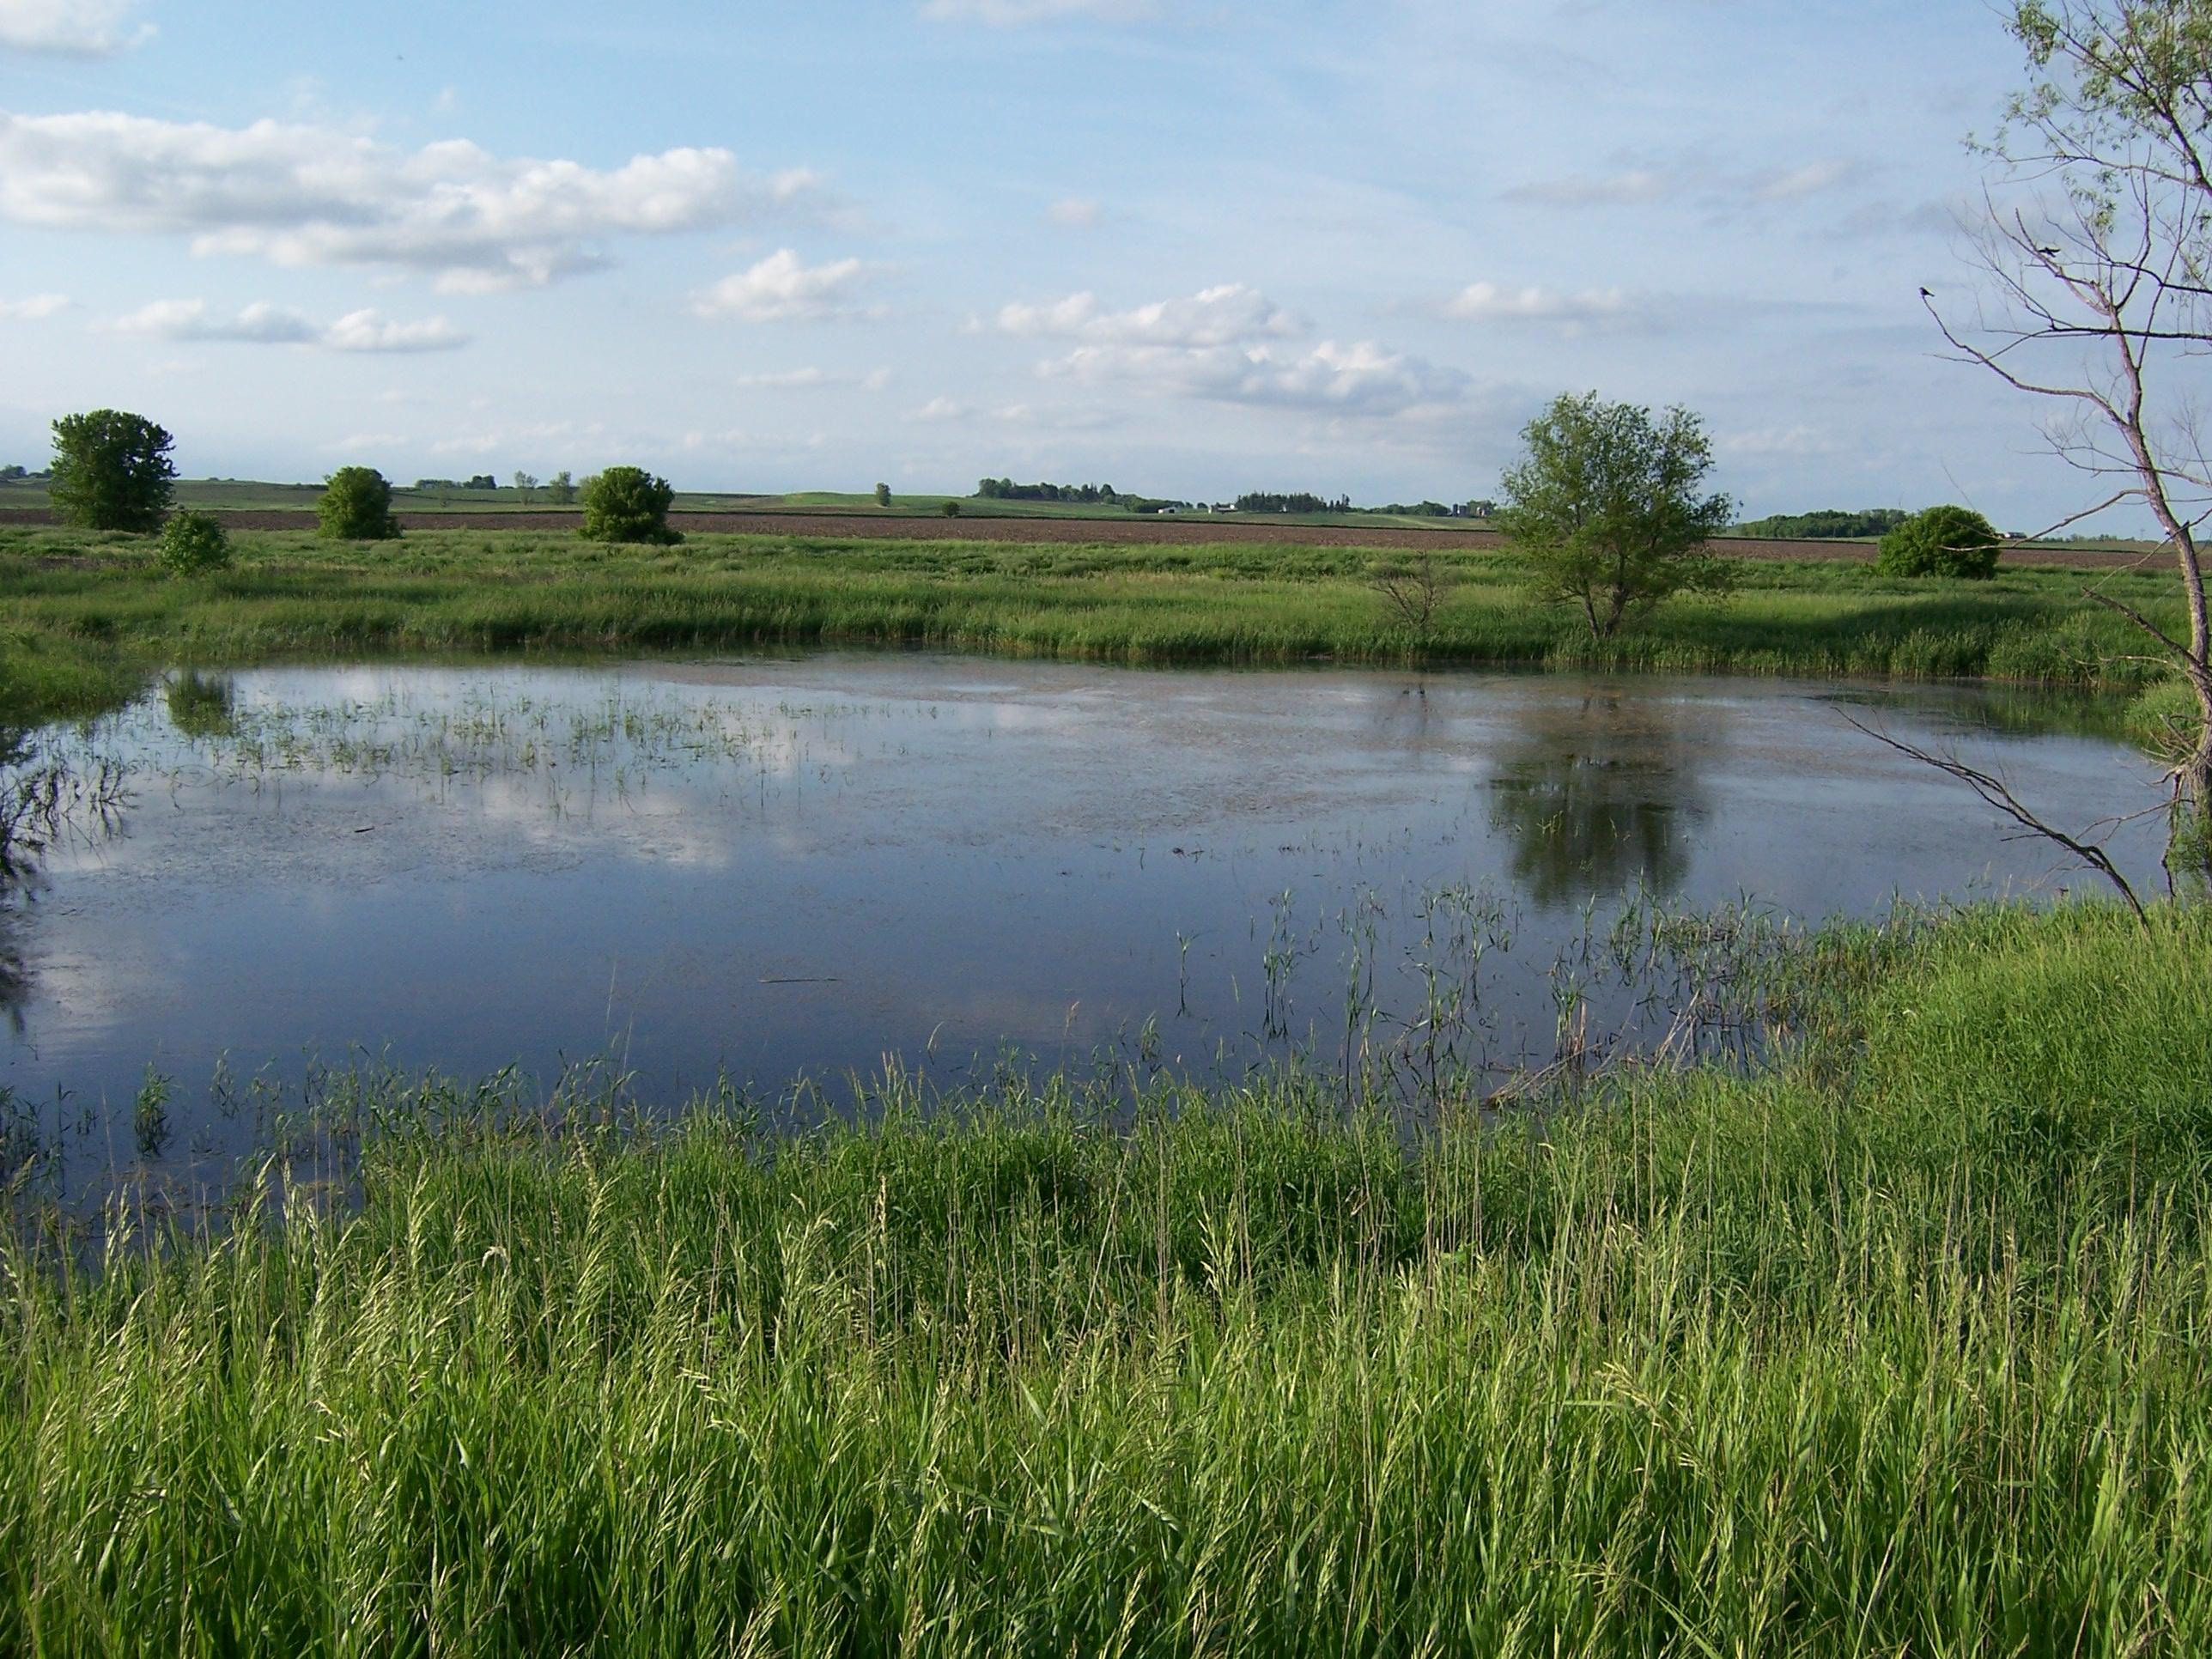 landscape of water